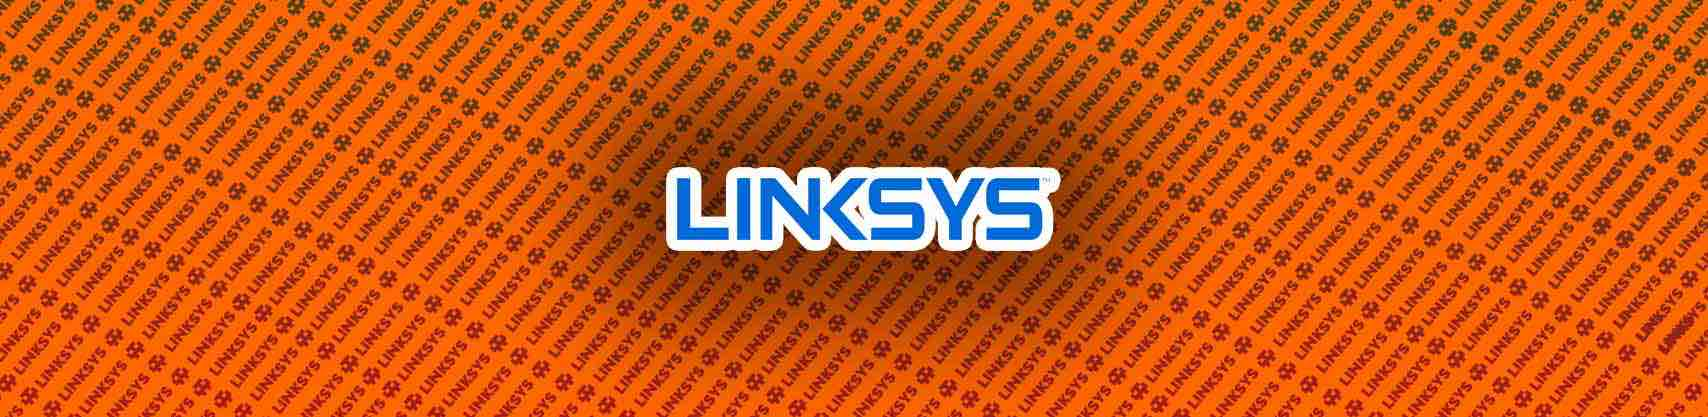 Linksys RE6300 Manual